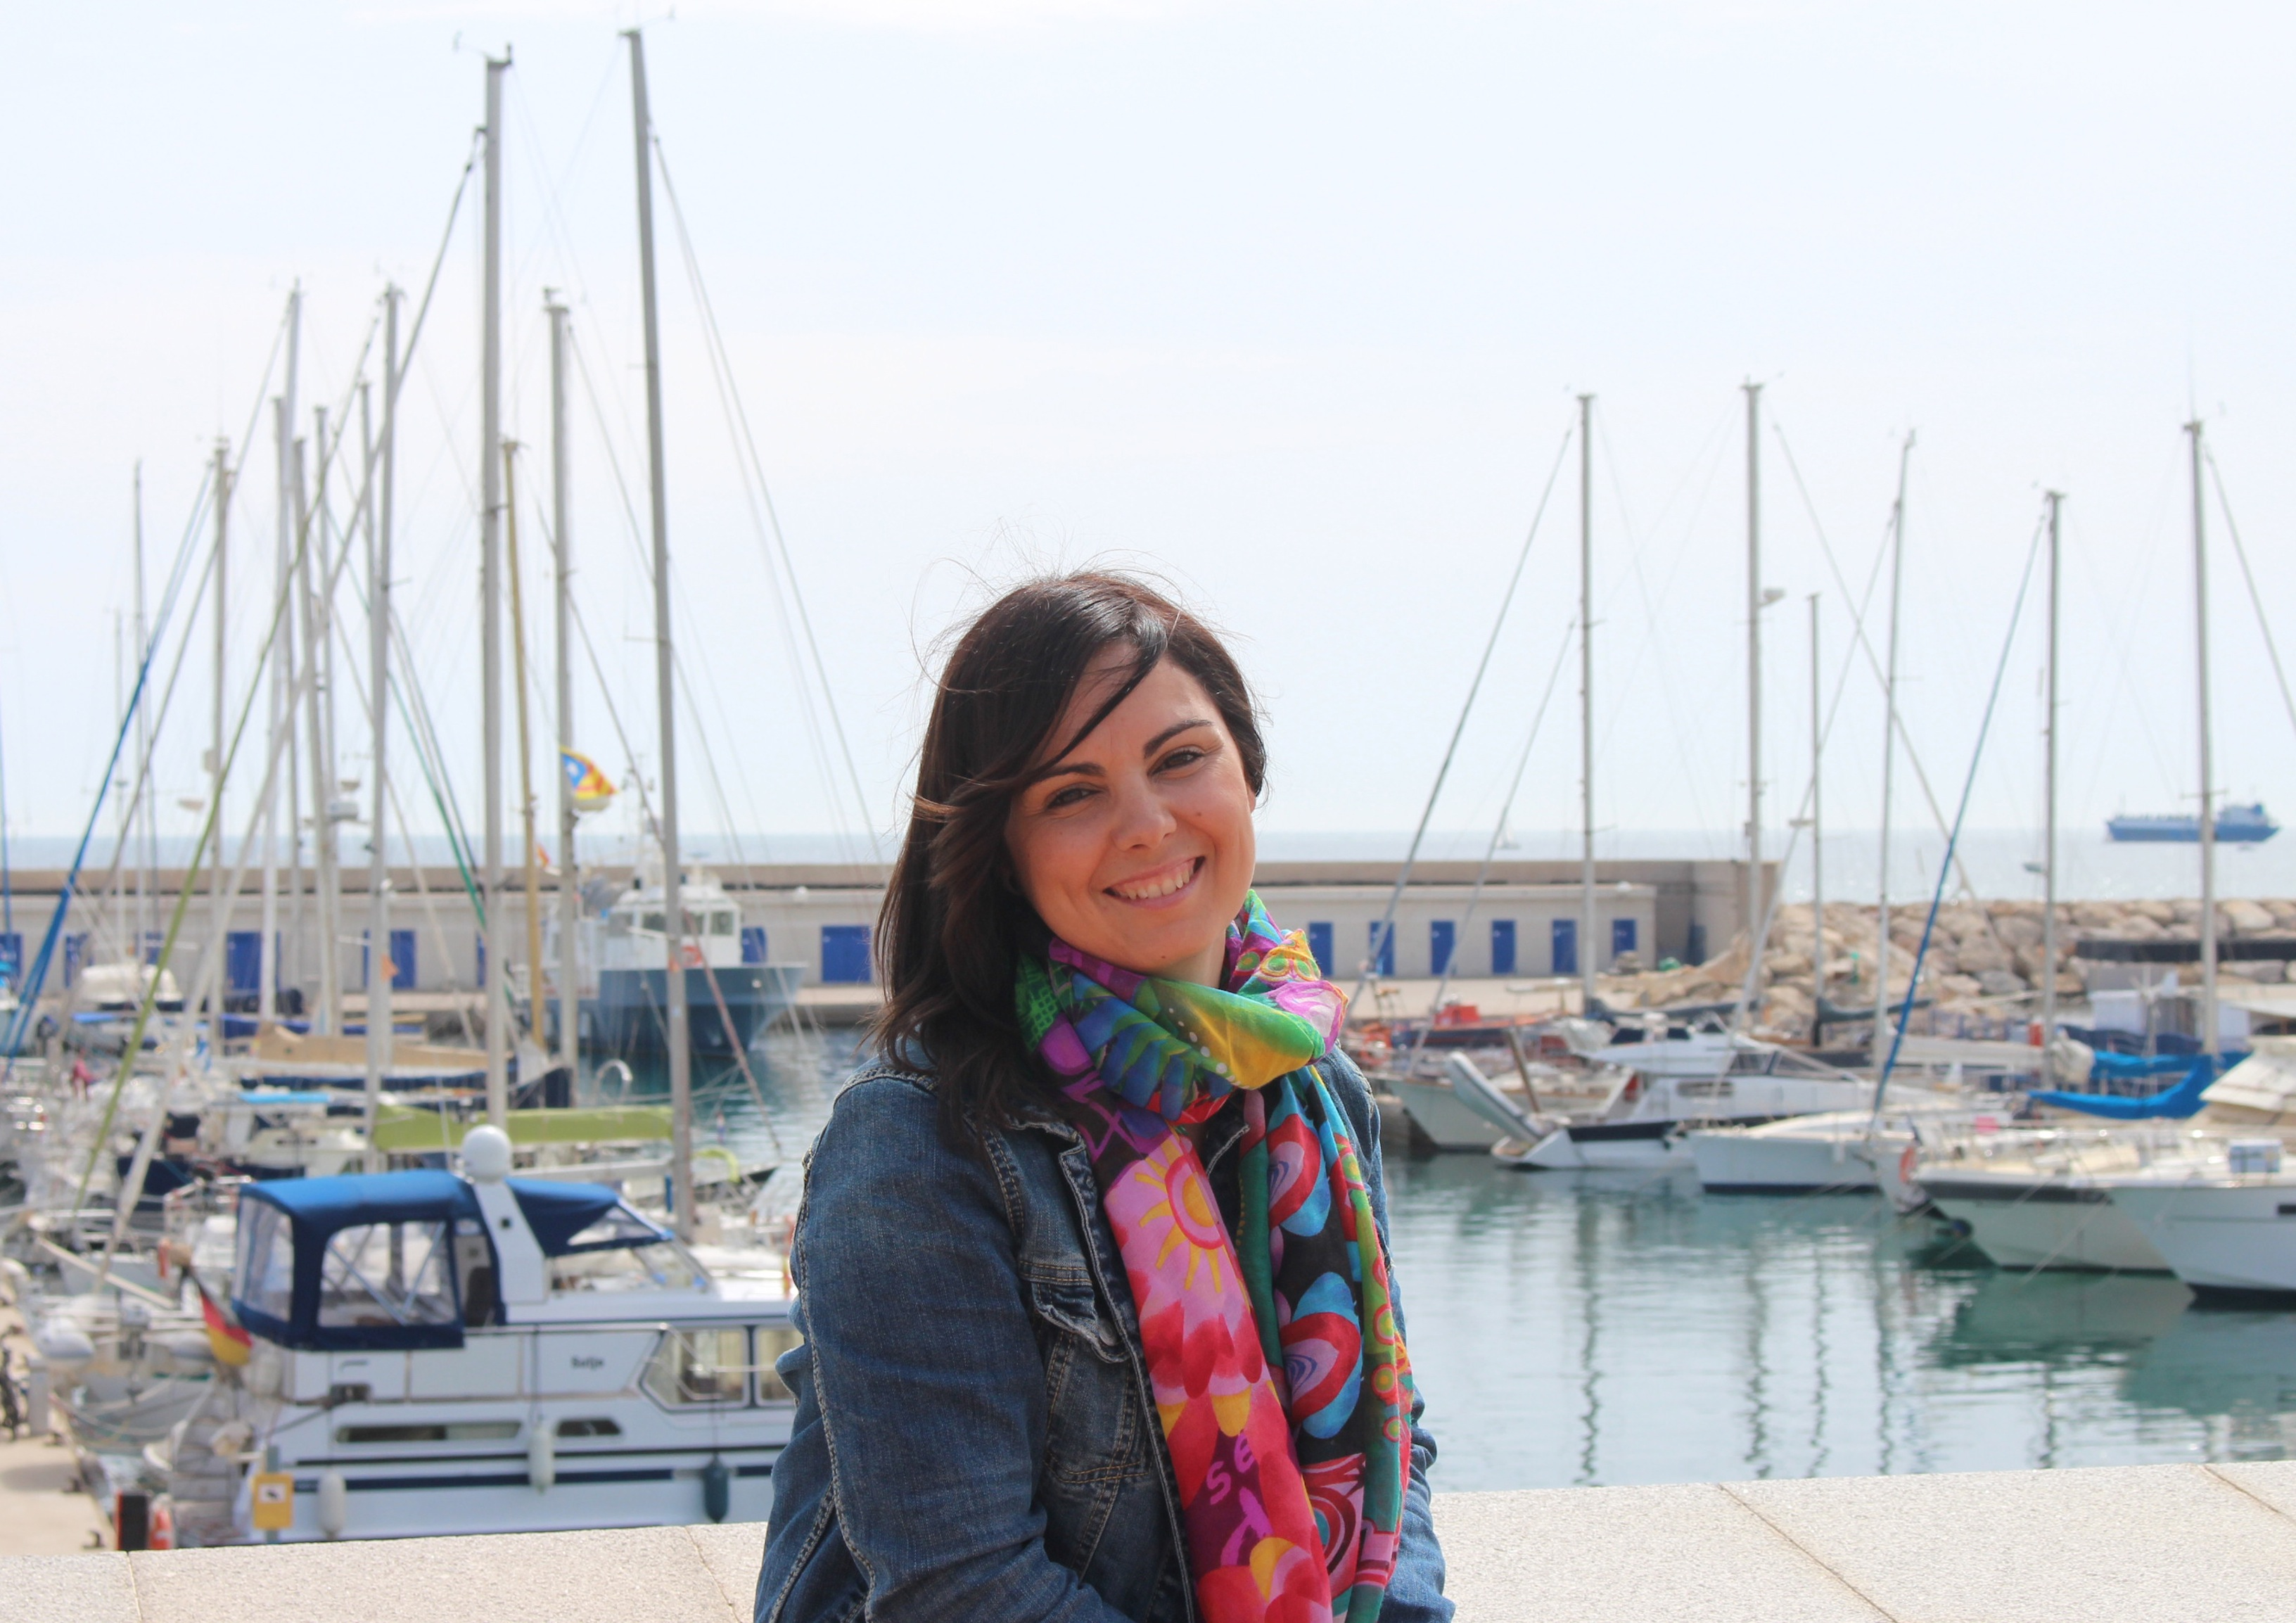 Cati Núñez Roa